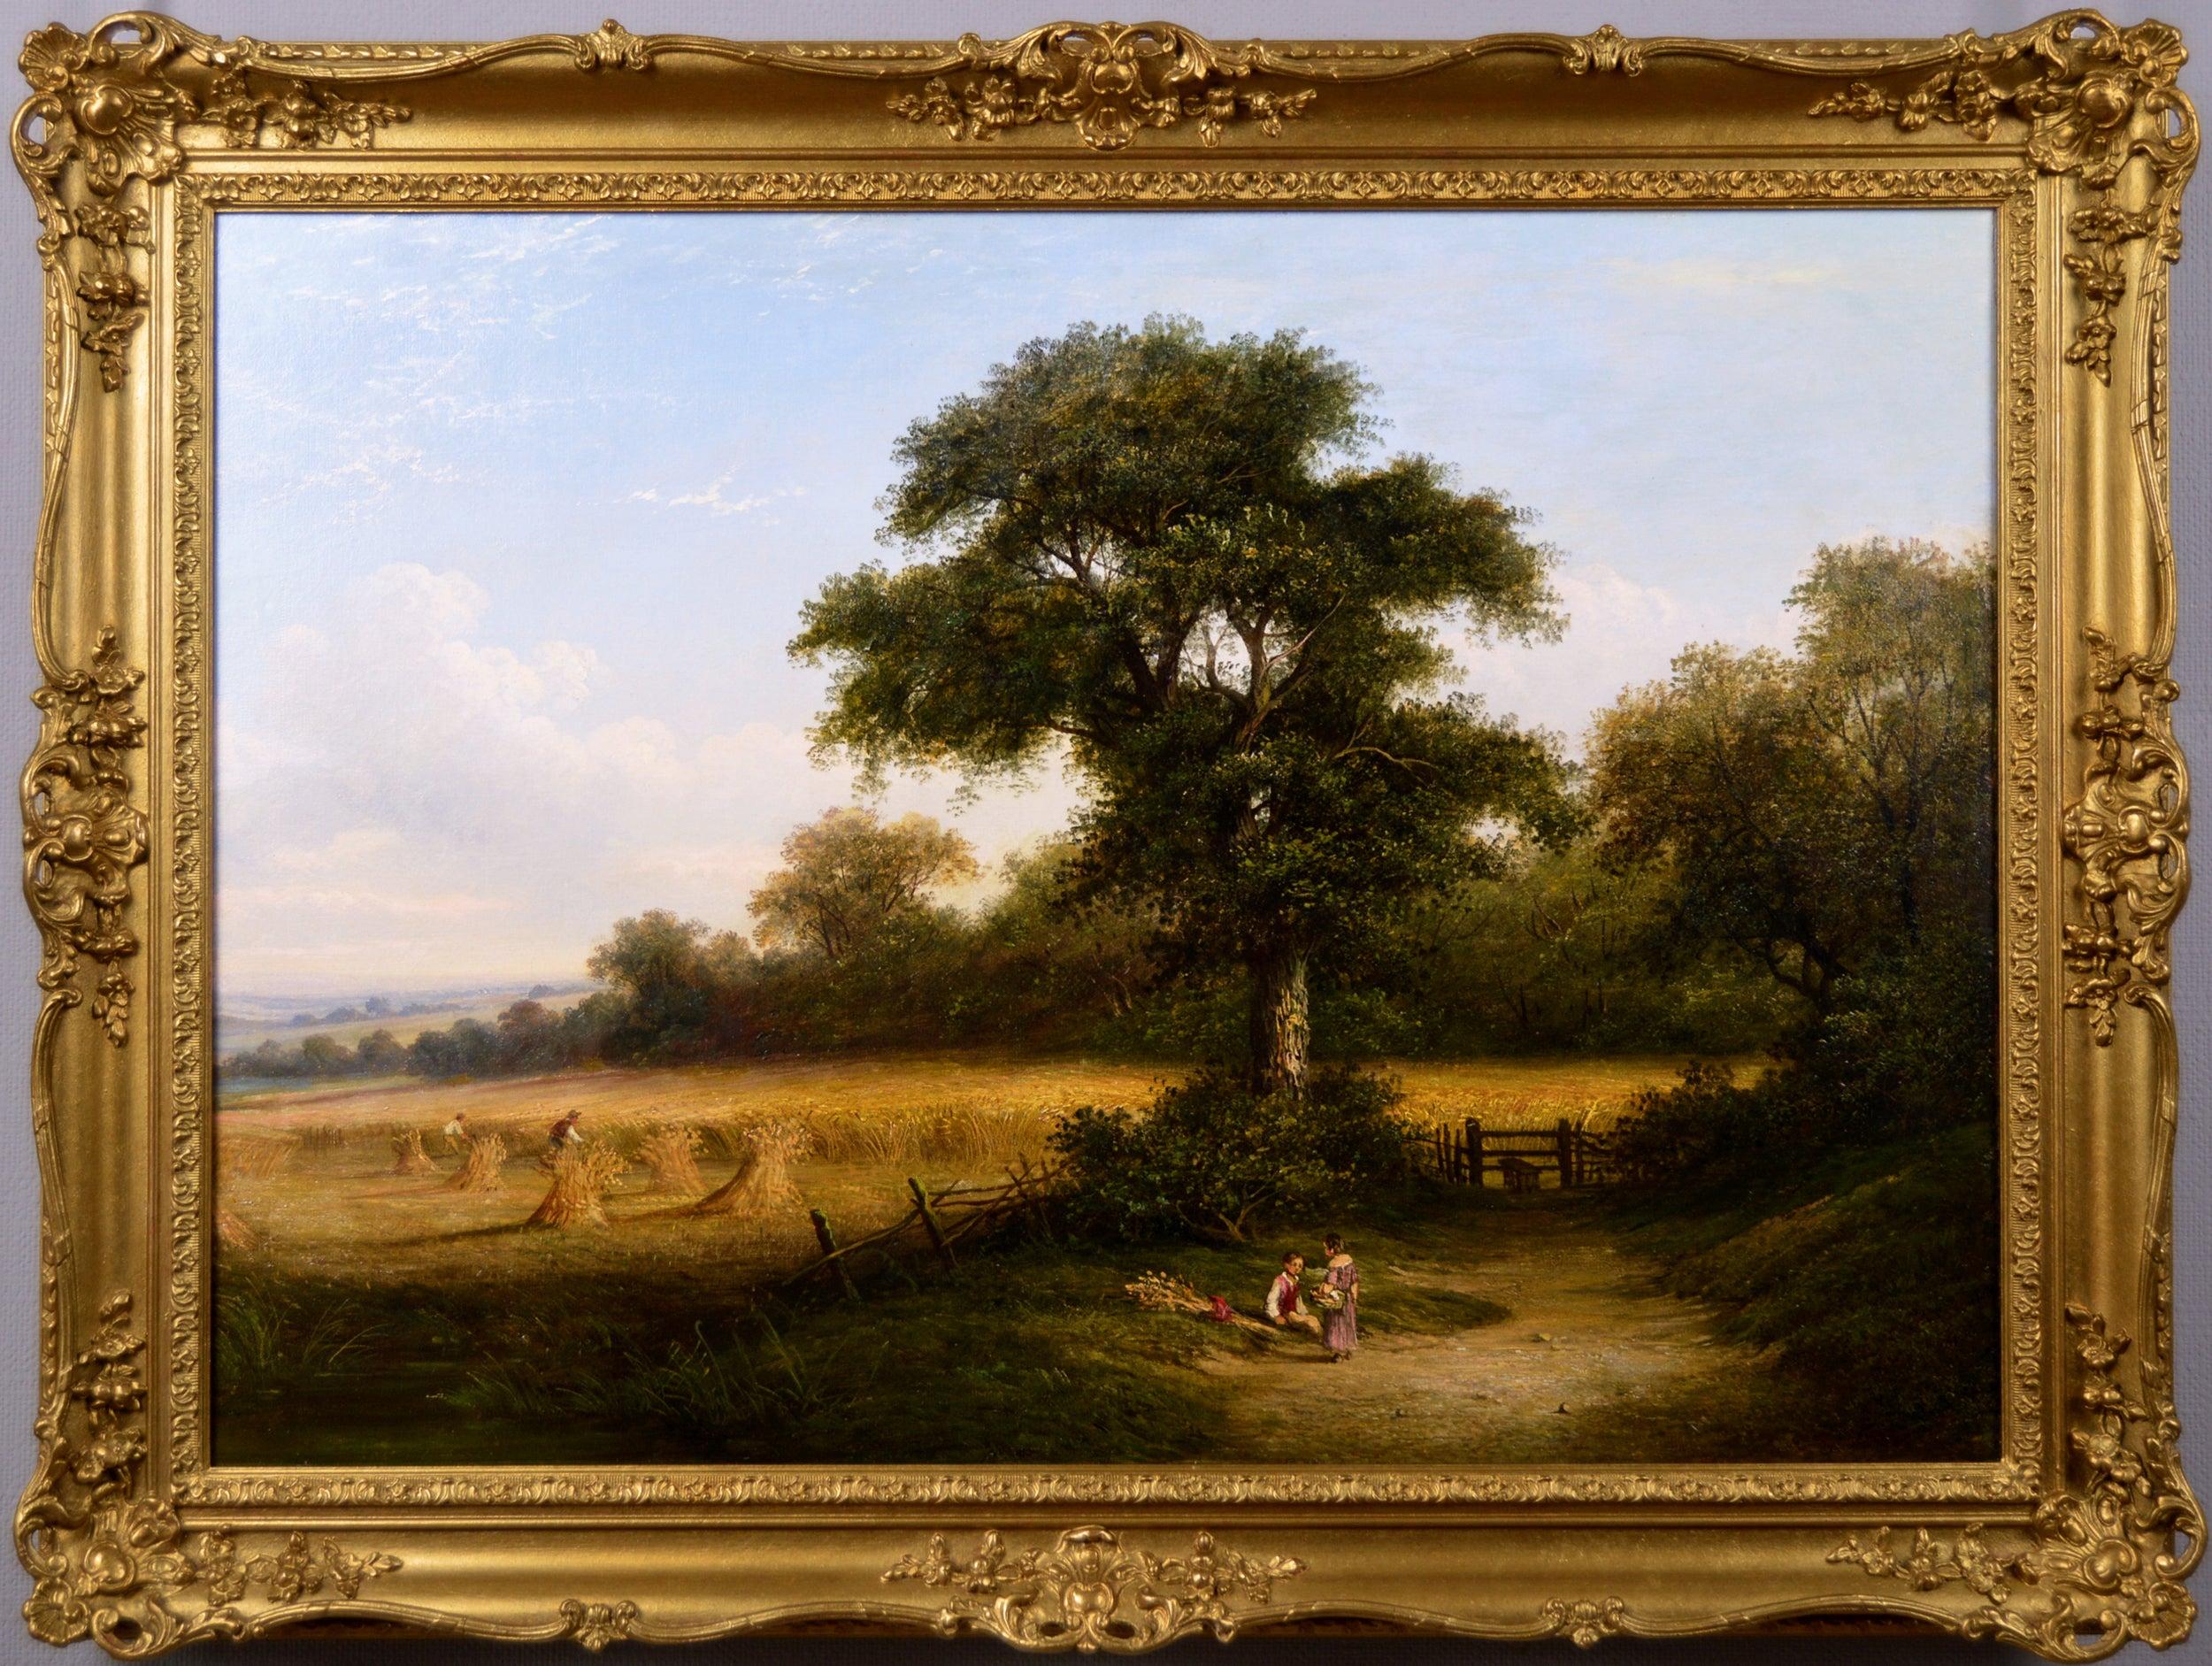 19th Century harvest scene landscape oil painting